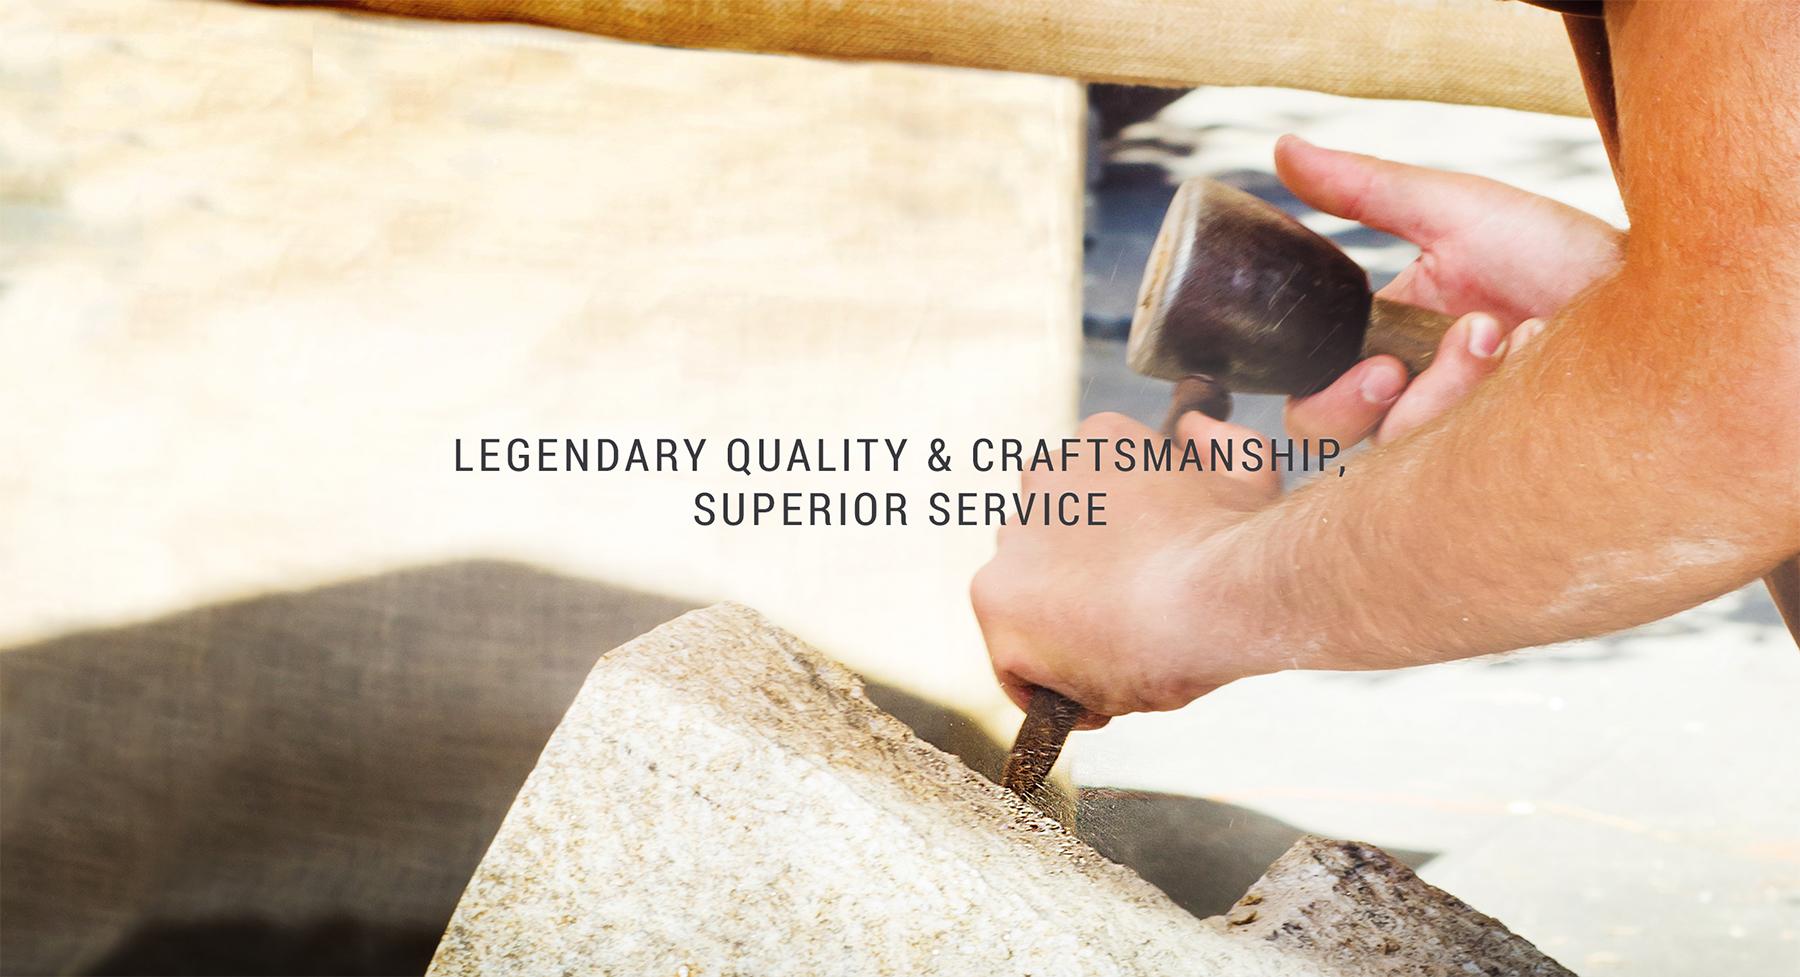 Legendary quality and craftsmanship, superior service.